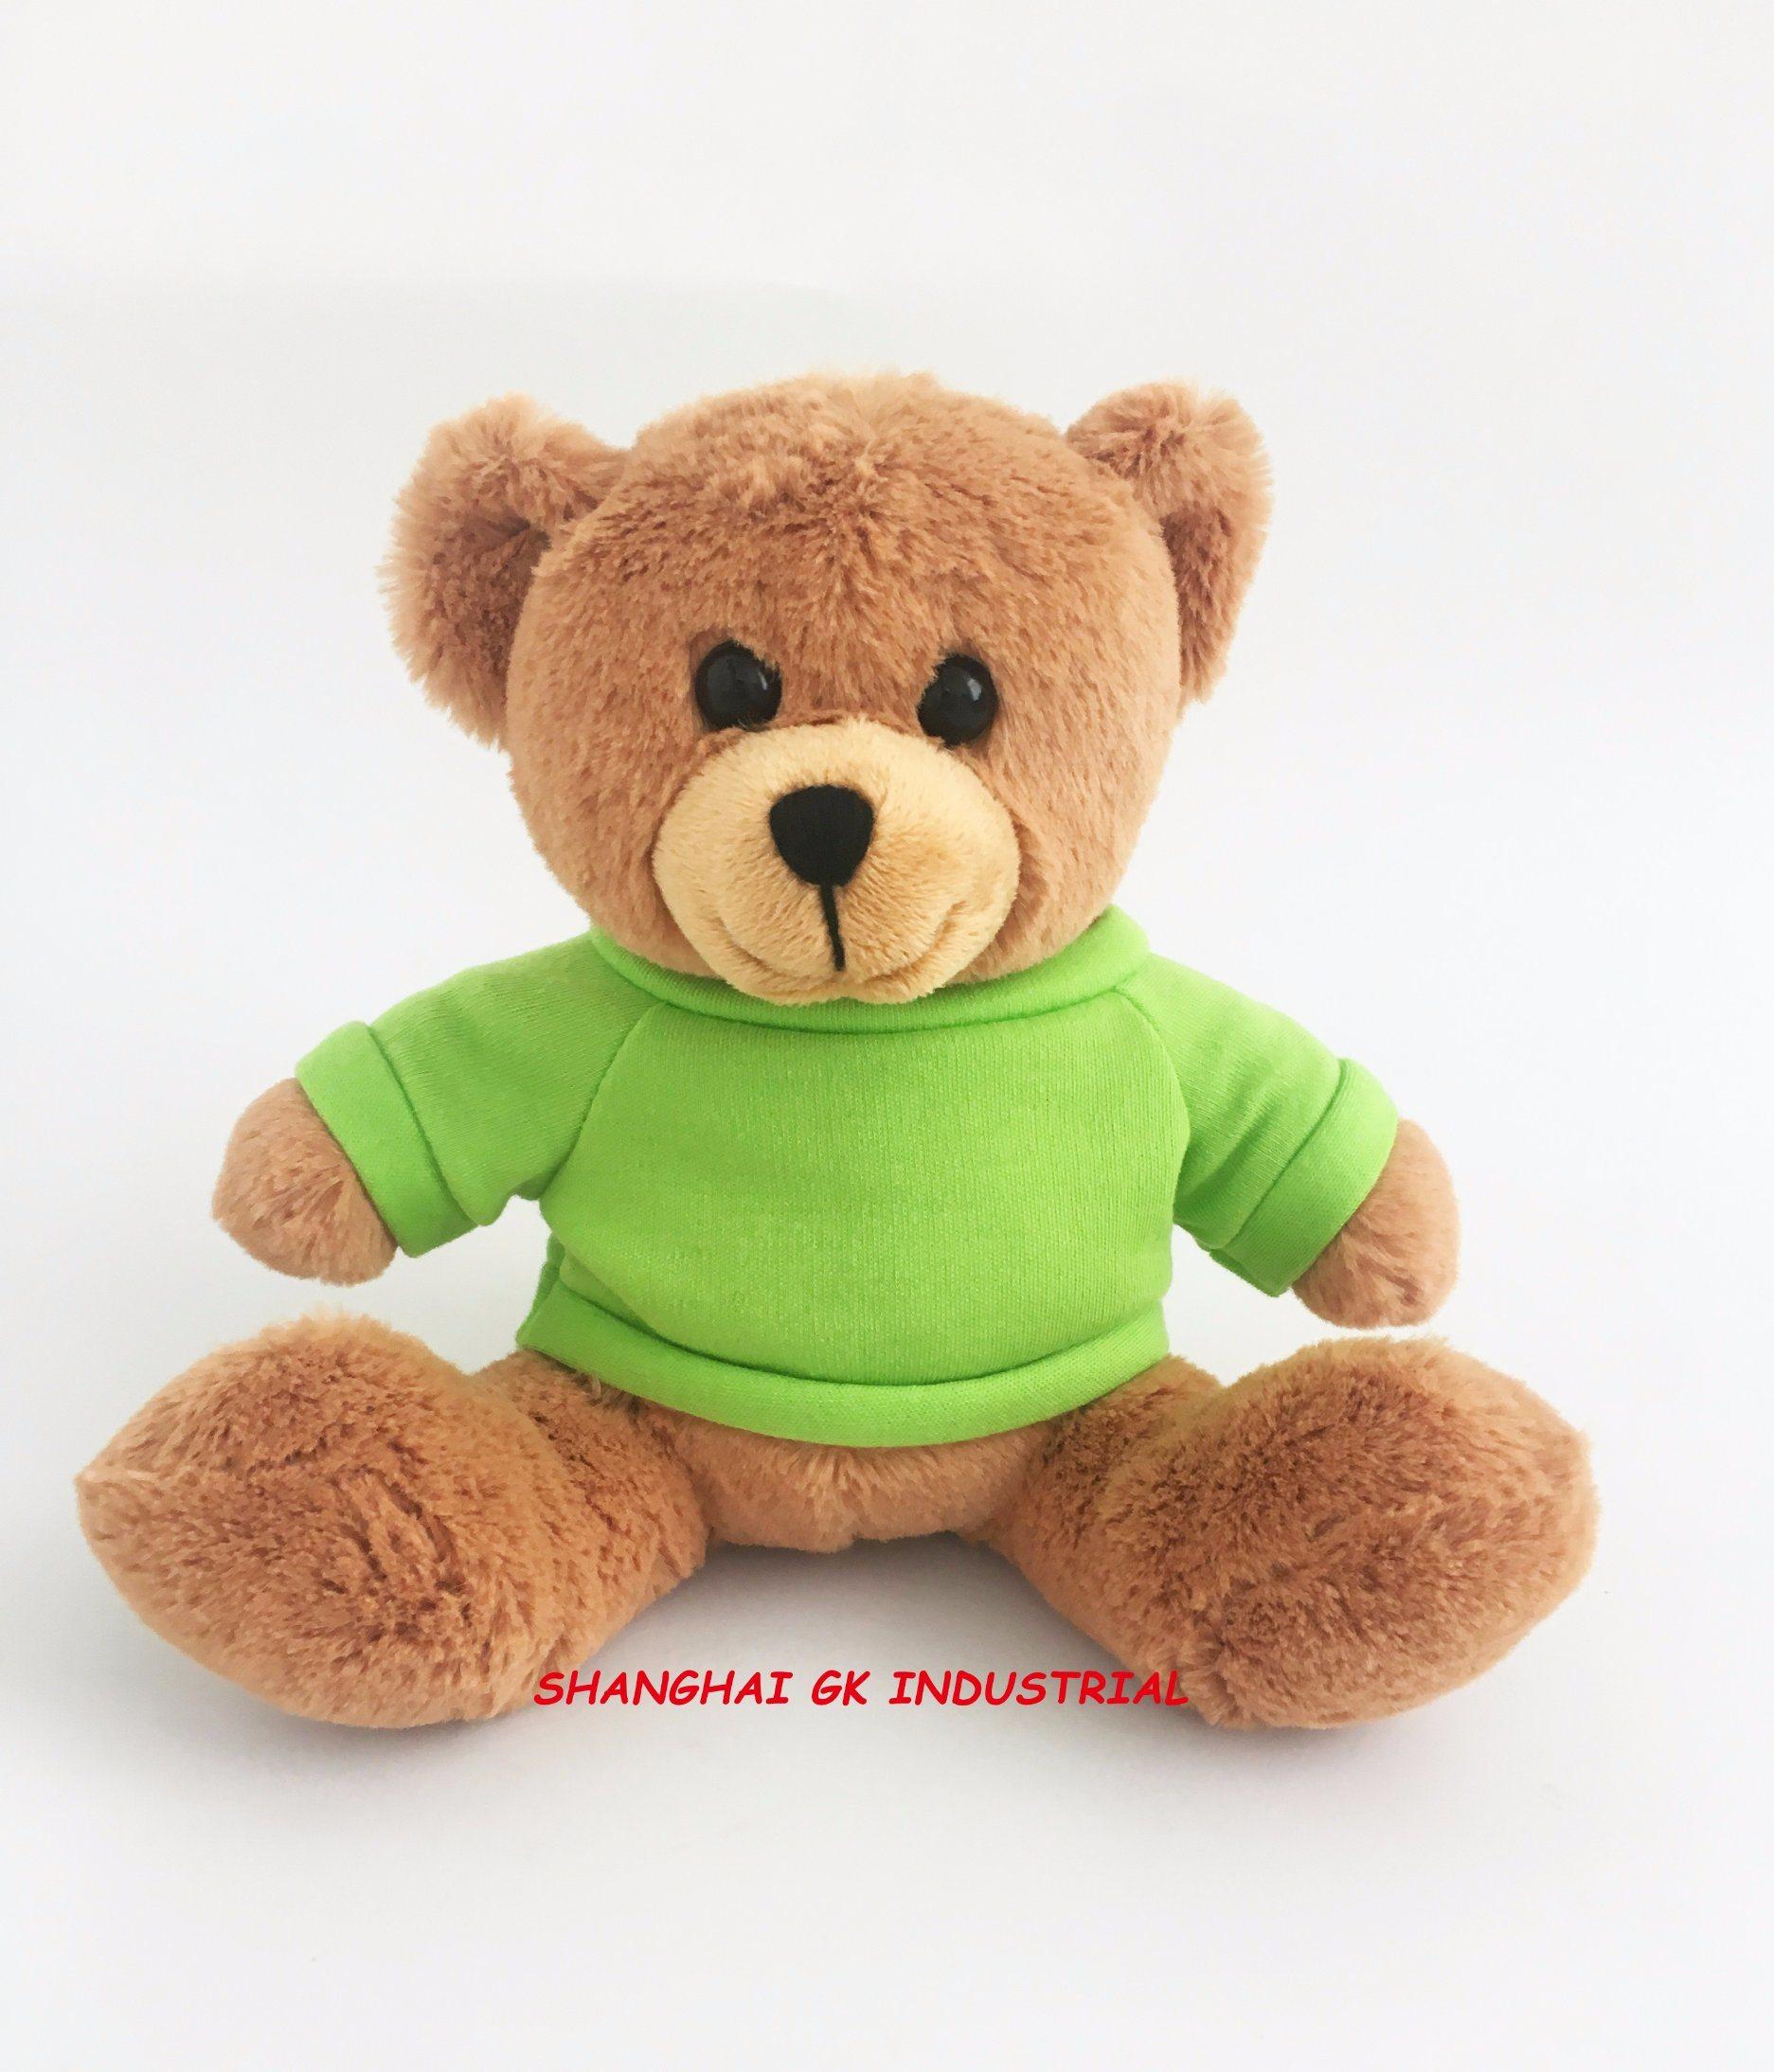 2a94e50c7367 China Plush Teddy Bear Cute Plush Teddy Bear with Green T-Shirt - China Teddy  Bear, Plush Toy